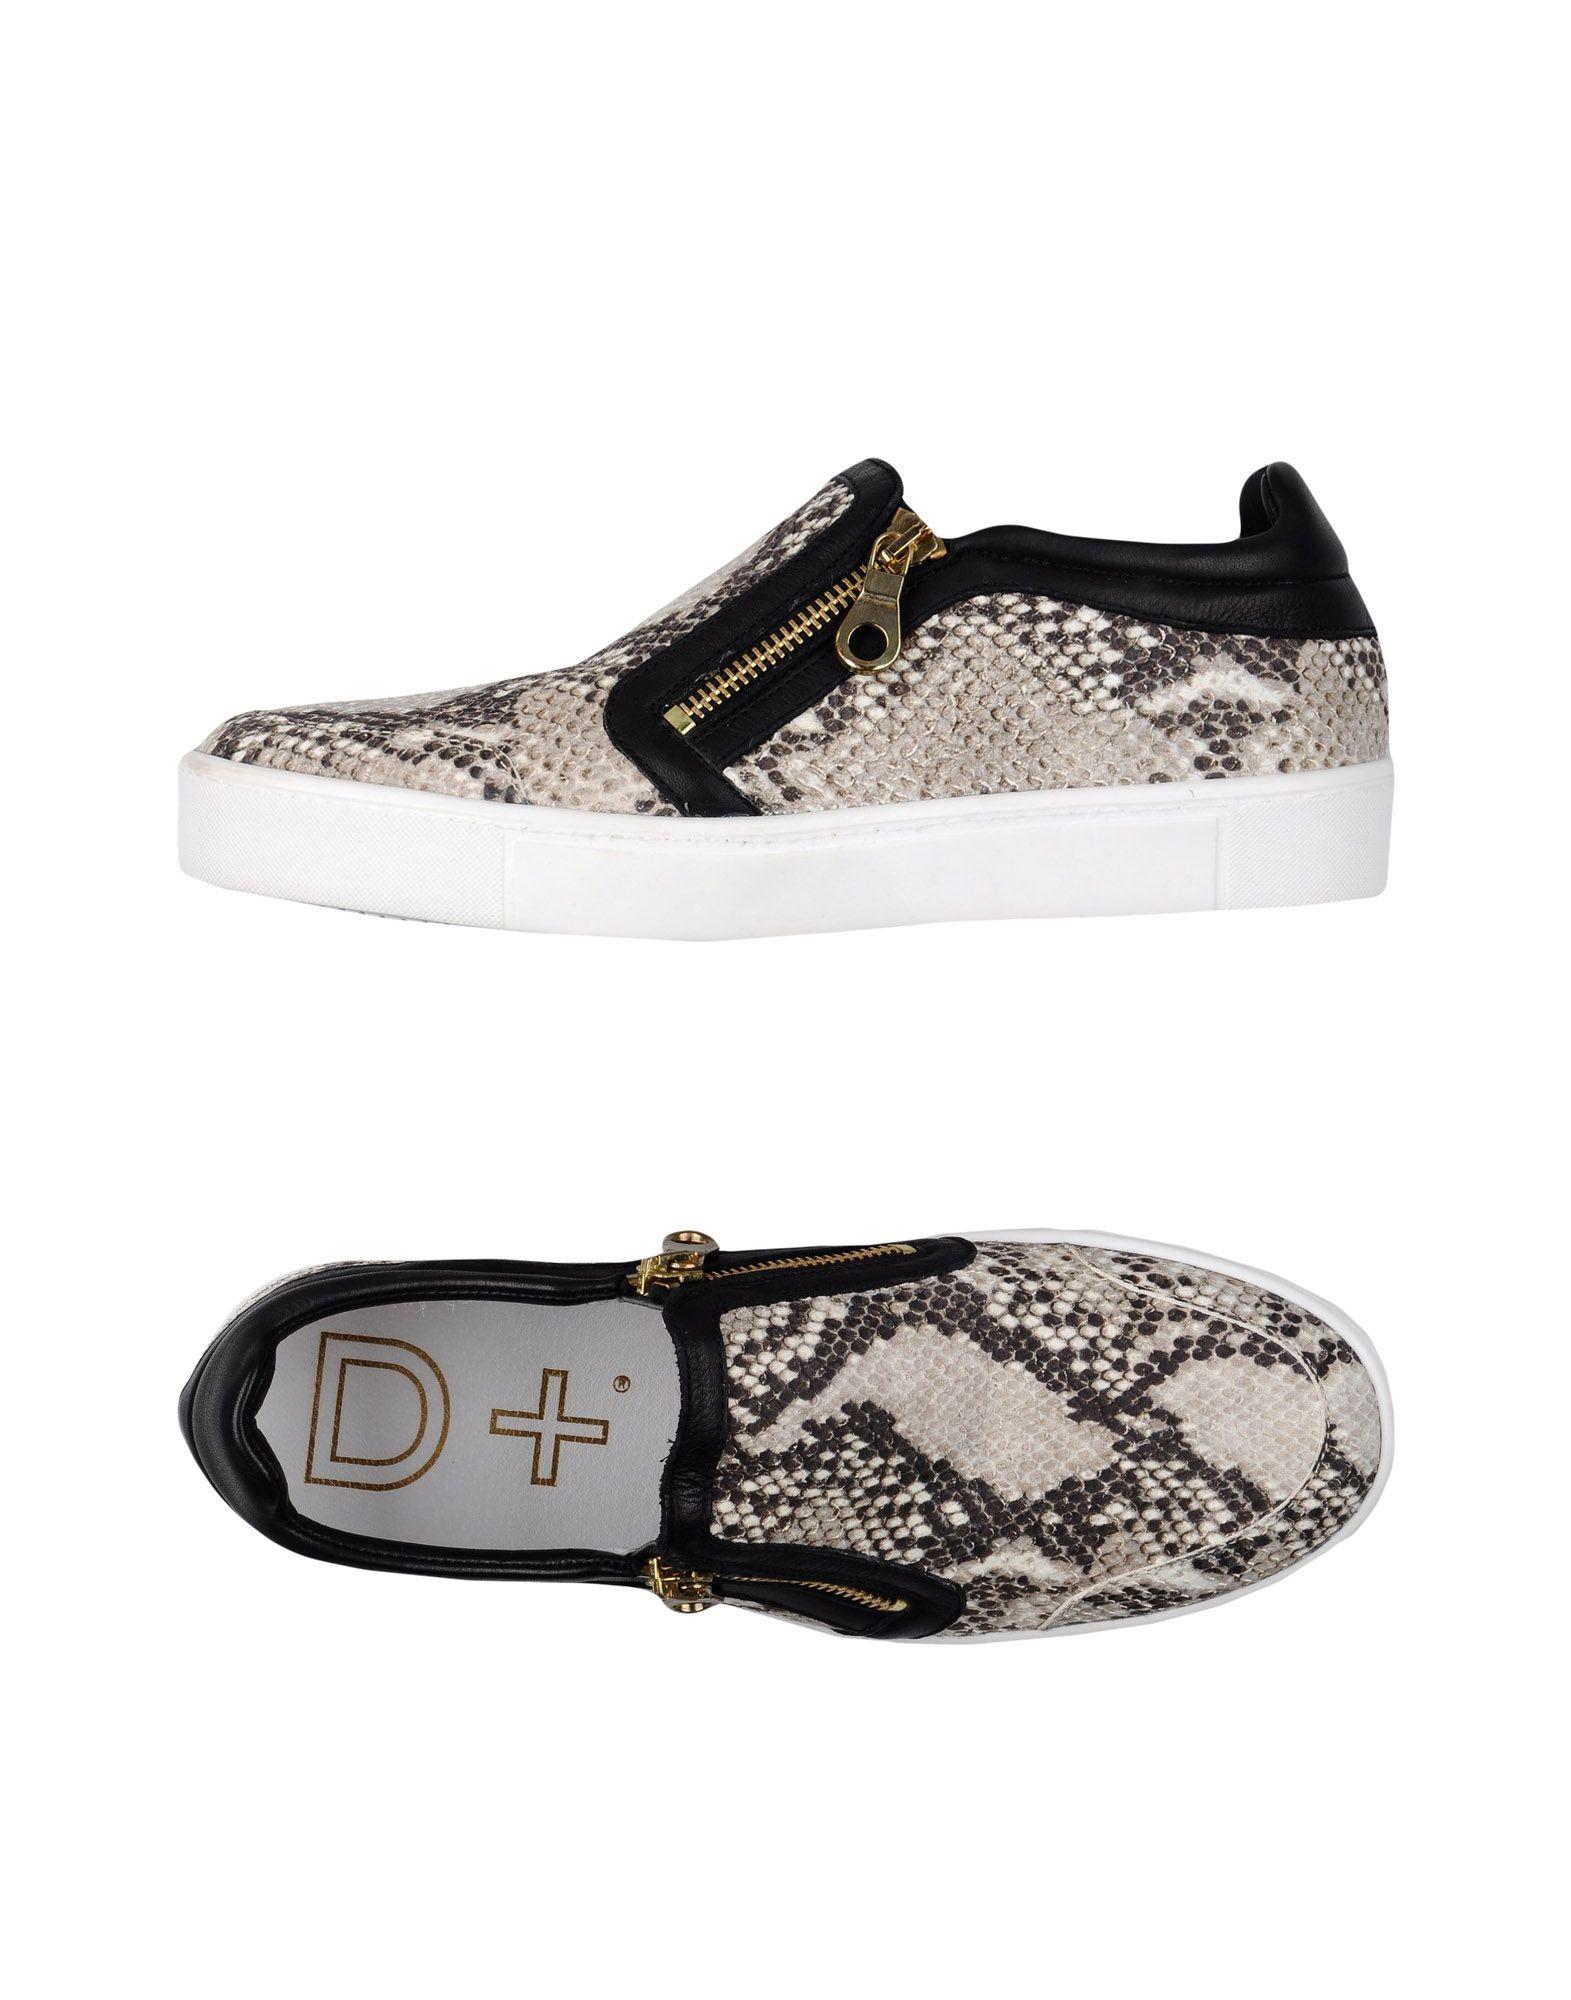 Sneakers D+ Femme - Sneakers D+ sur